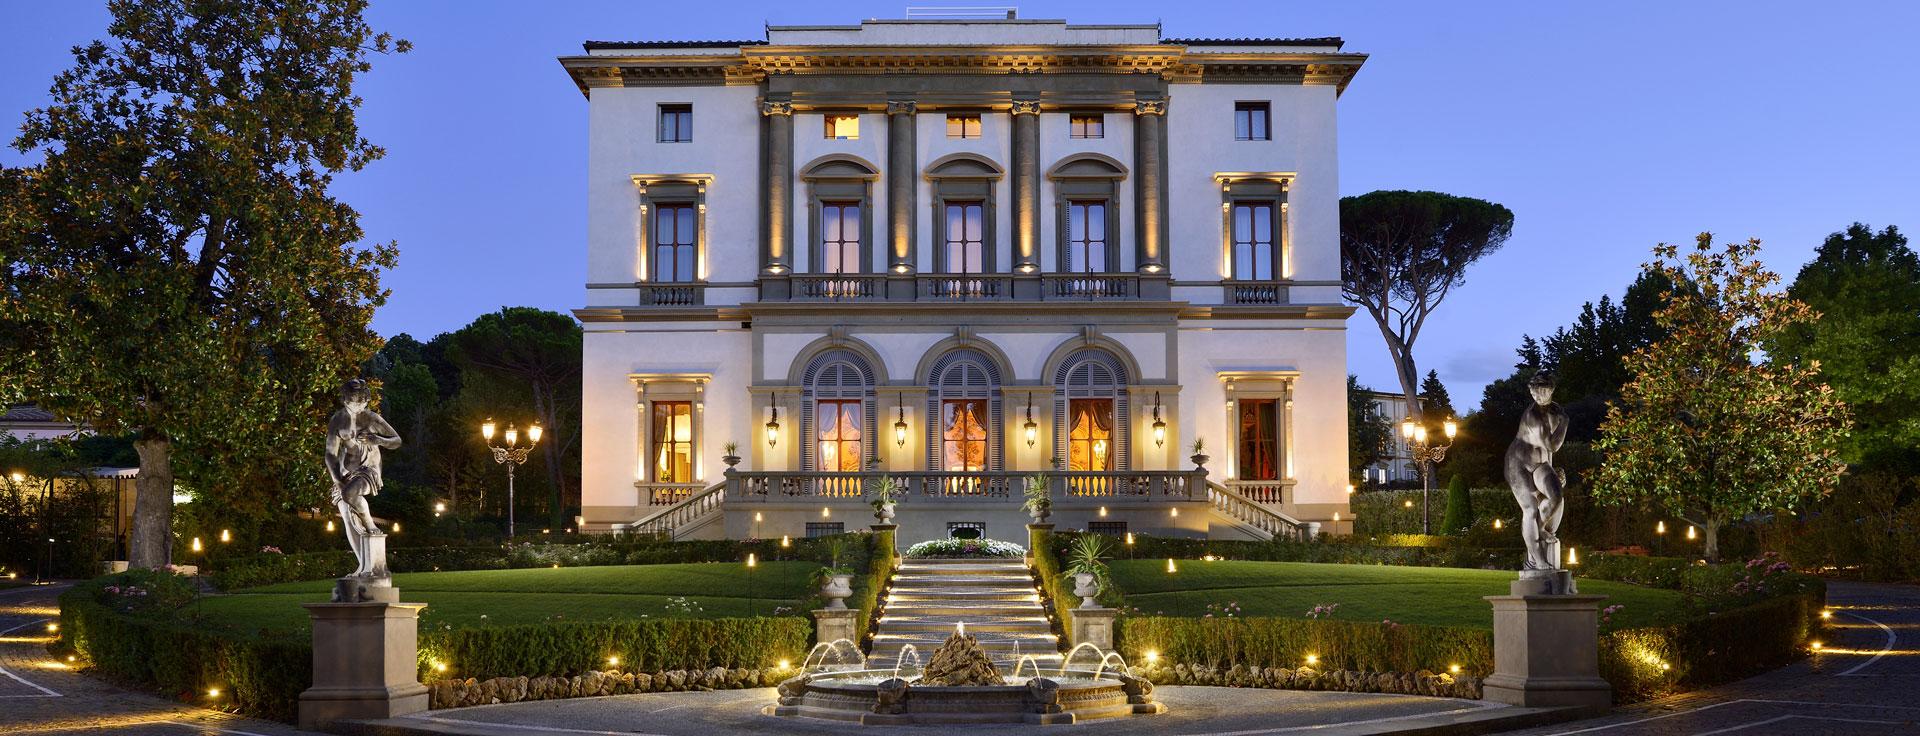 Villa Cora Florence Italy